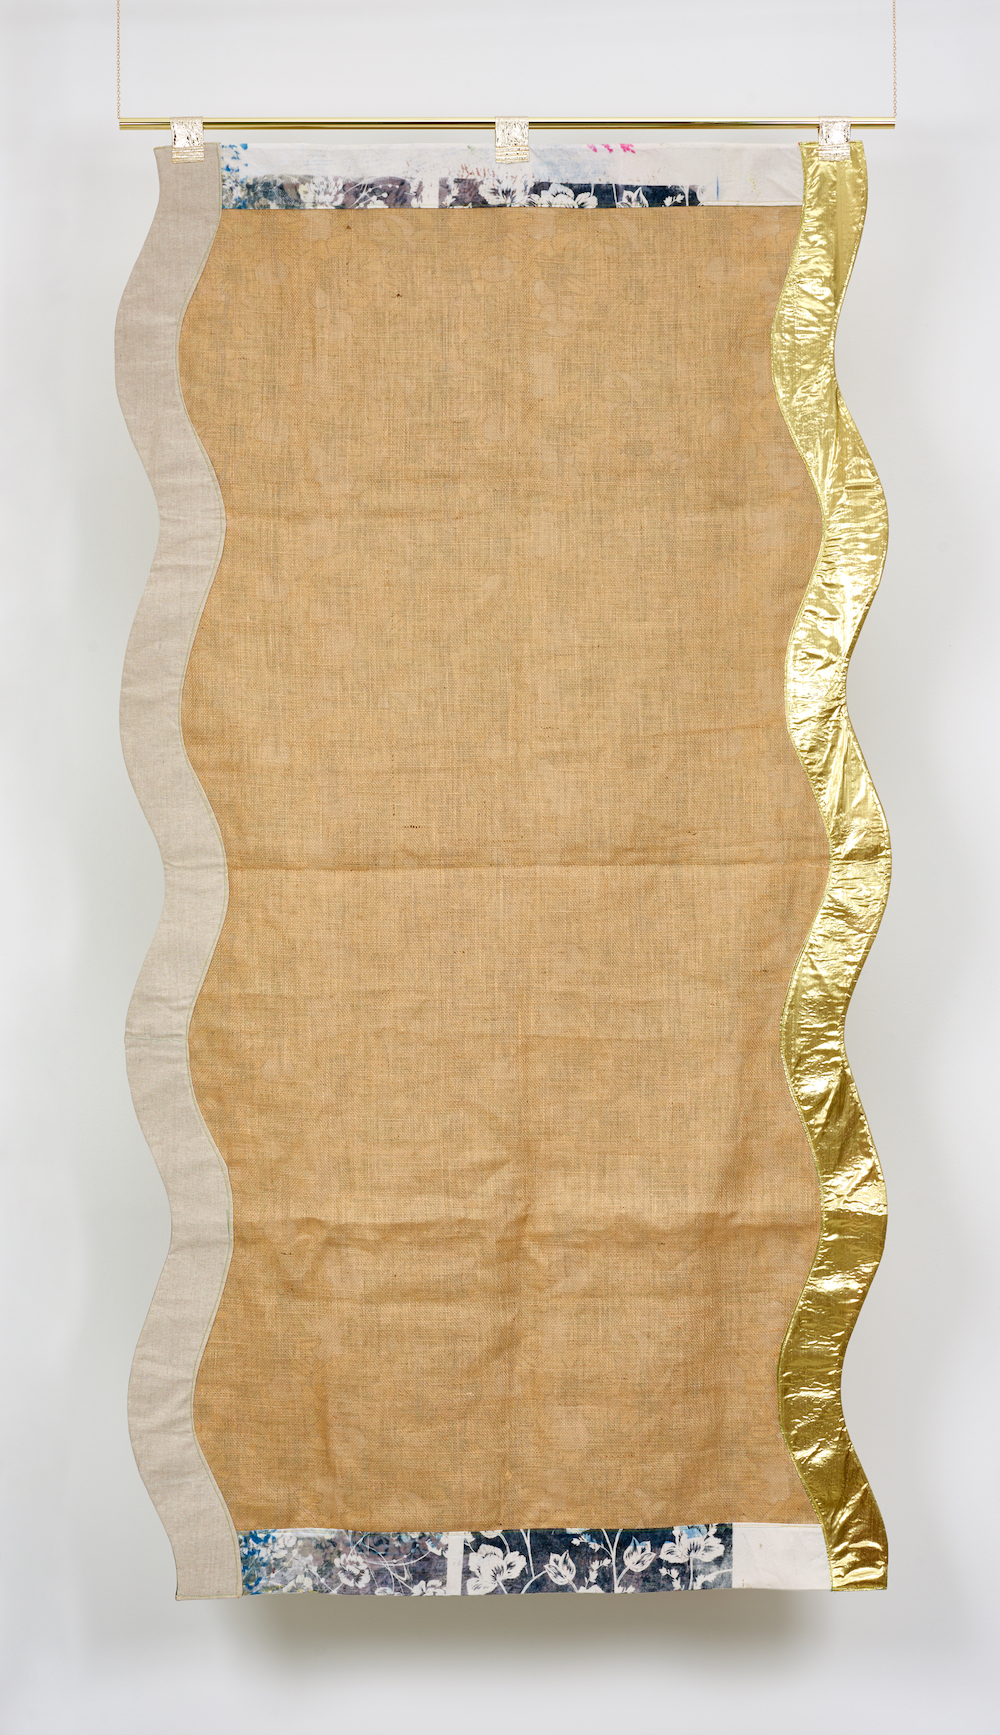 Ludovica Gioscia, Portal 19, 2019. Fabric, thread and metal pole. 234 x 120 cm. Photographer Jonathon Bassett.